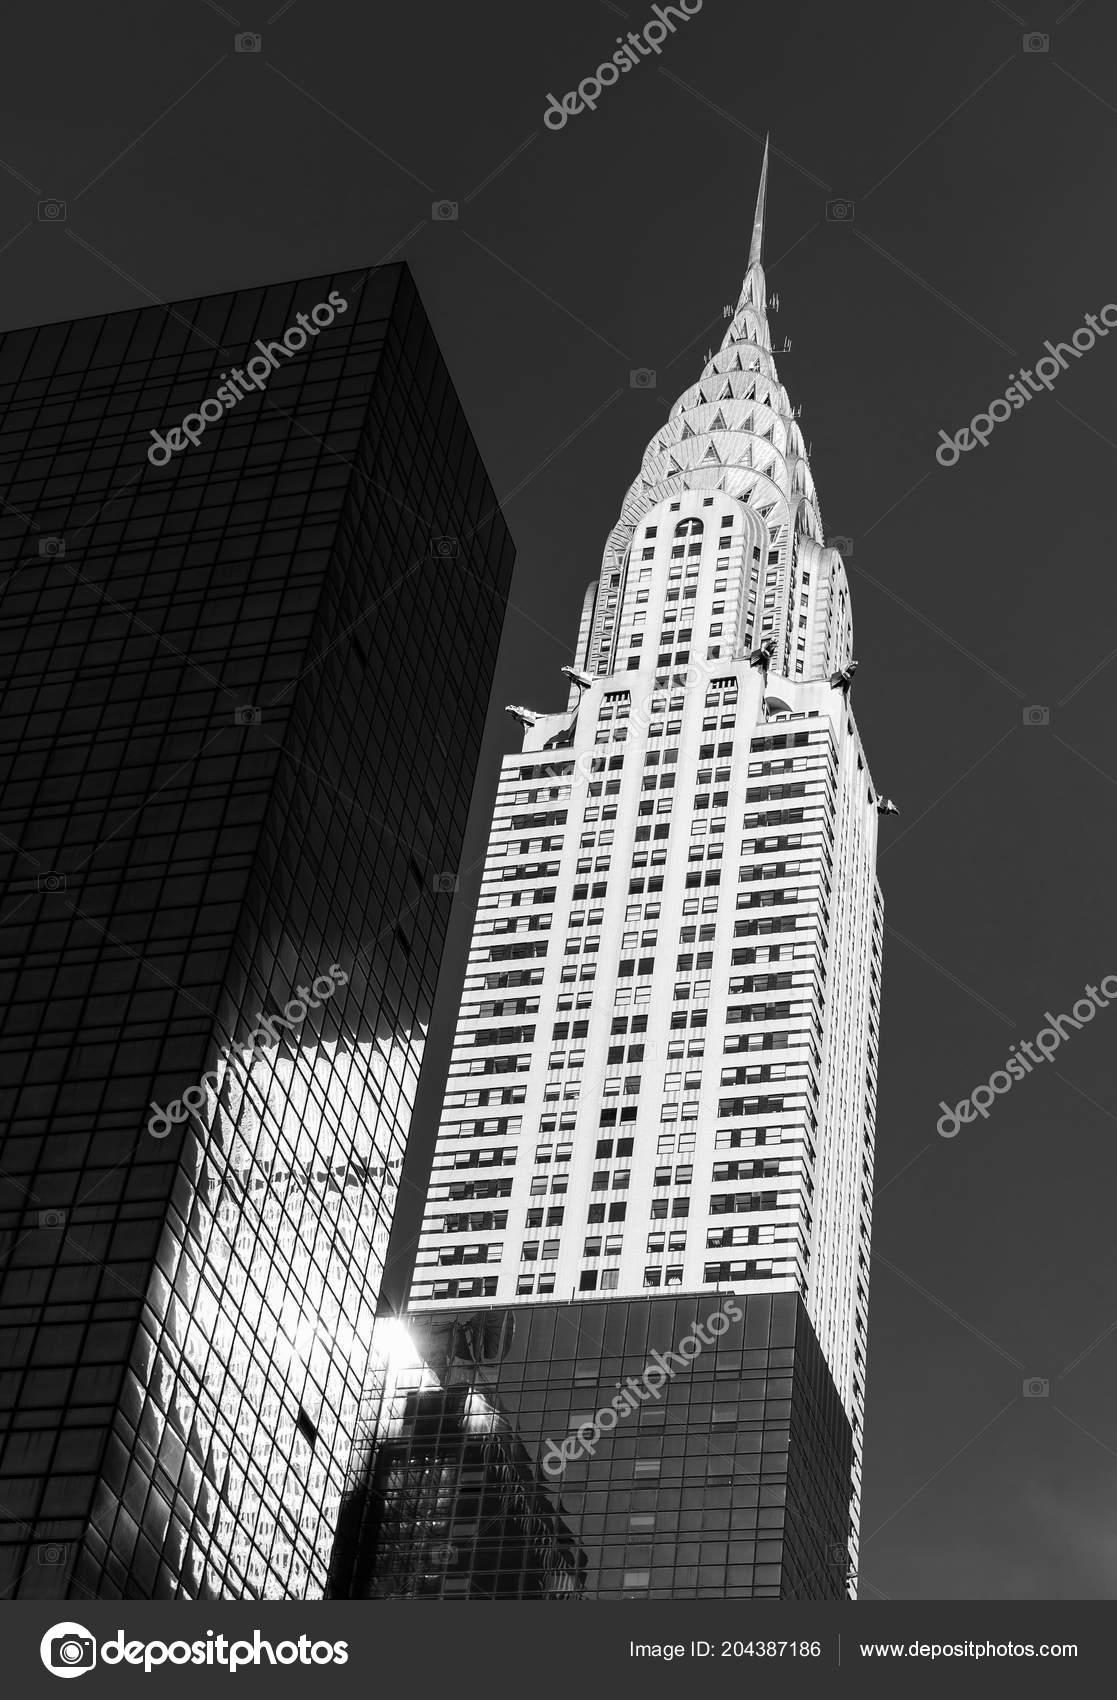 New York Usa Jun 2014 Black White Image Chrysler Building Stock Photo